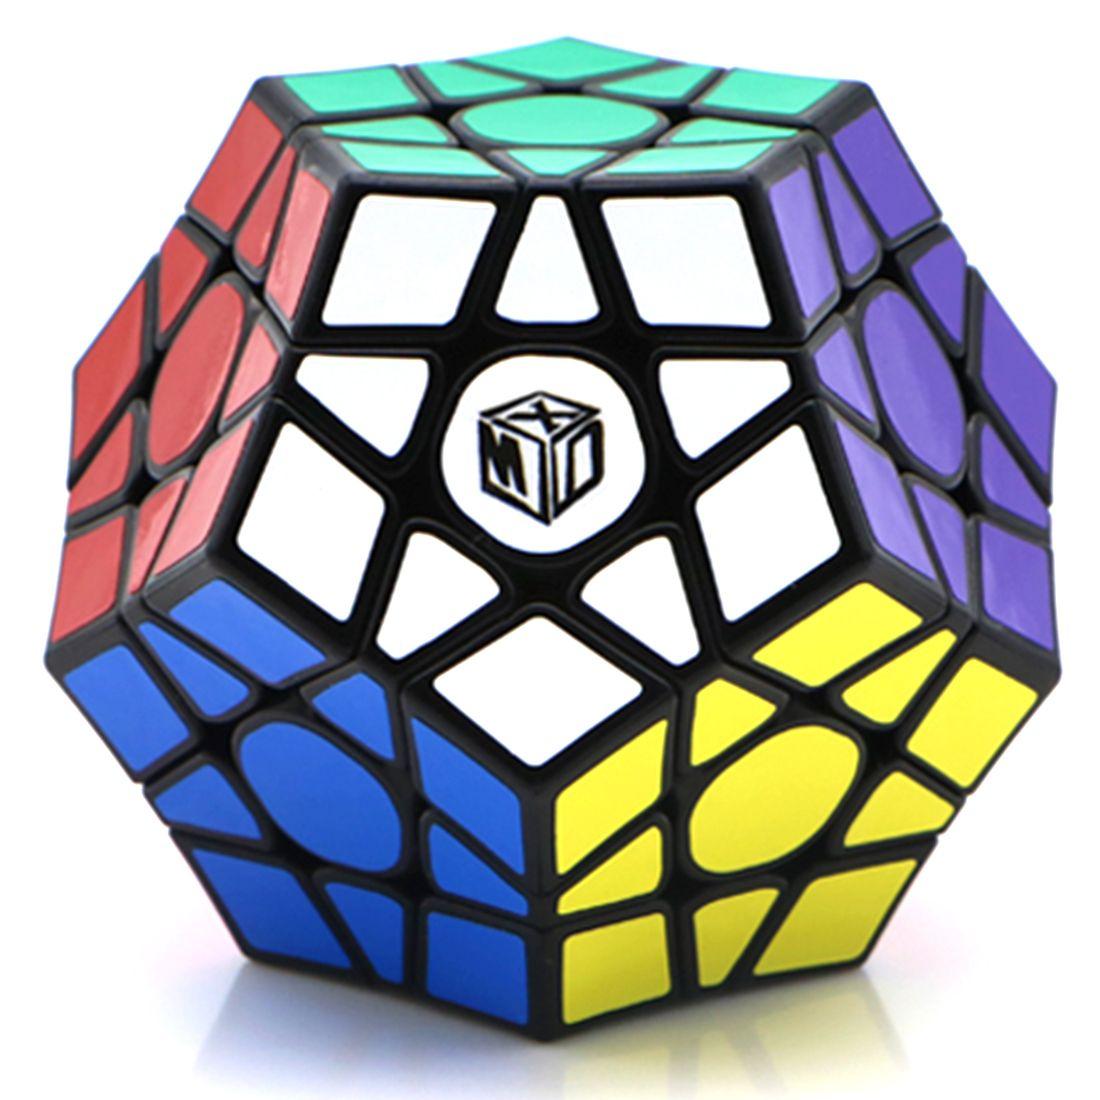 Qiyi Galaxy V2 Megaminx Magic Cube Логические головоломки игрушки (вогнутая Тип)-черный-база